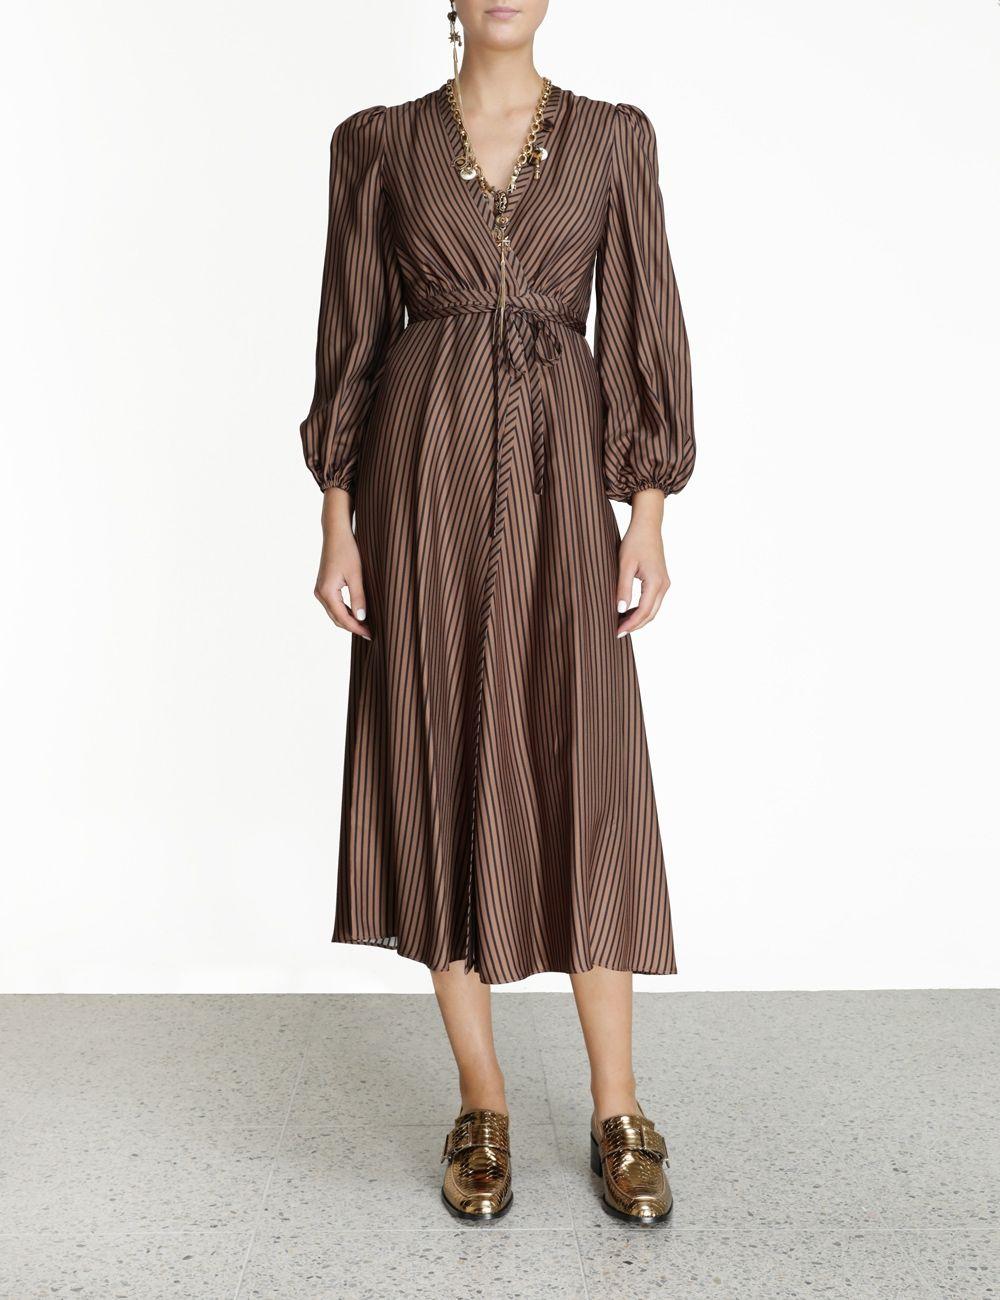 Silk Twill Wrap Dress Tan Stripe Online Zimmermann Dresses Wrap Dress Aesthetic Clothes [ 1300 x 1000 Pixel ]